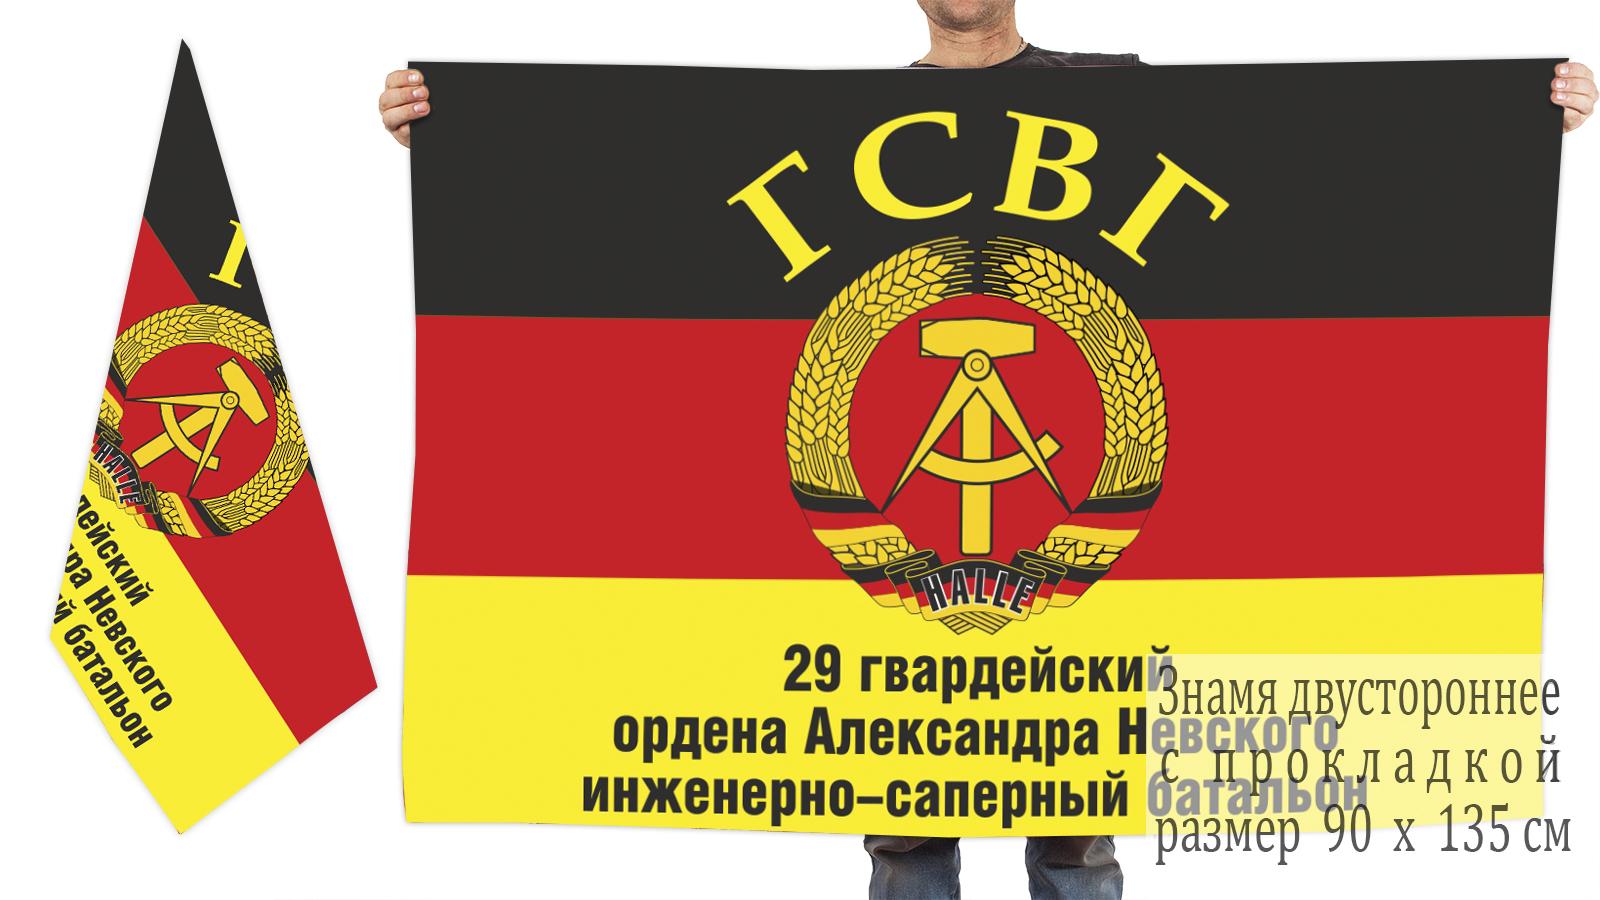 Двусторонний флаг 29 инженерно-сапёрного батальона ГСВГ